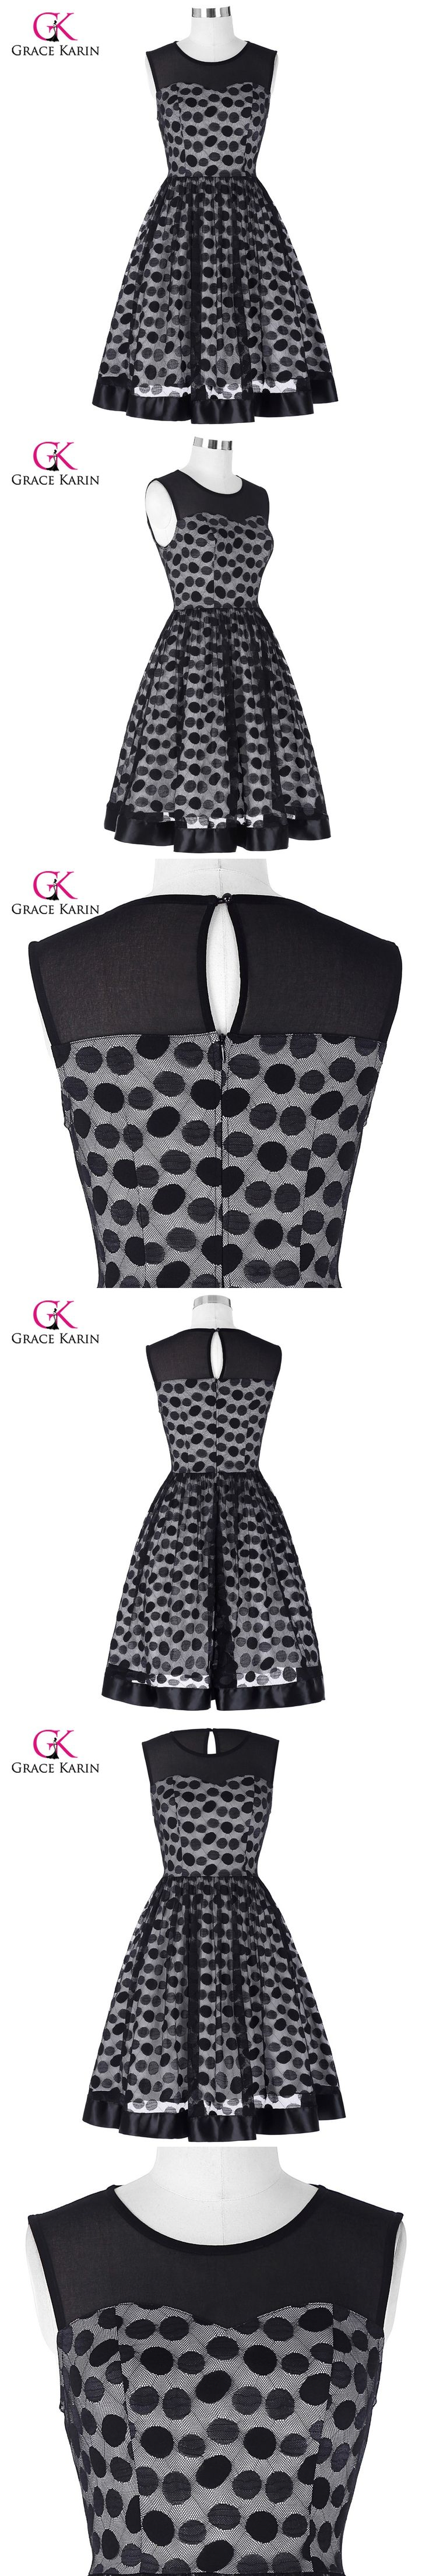 Grace Karin Short Evening Dress Polka Dot Print Vestidos Rockabilly Vintage Formal Evening Party Gowns Elegant Black Prom Dress